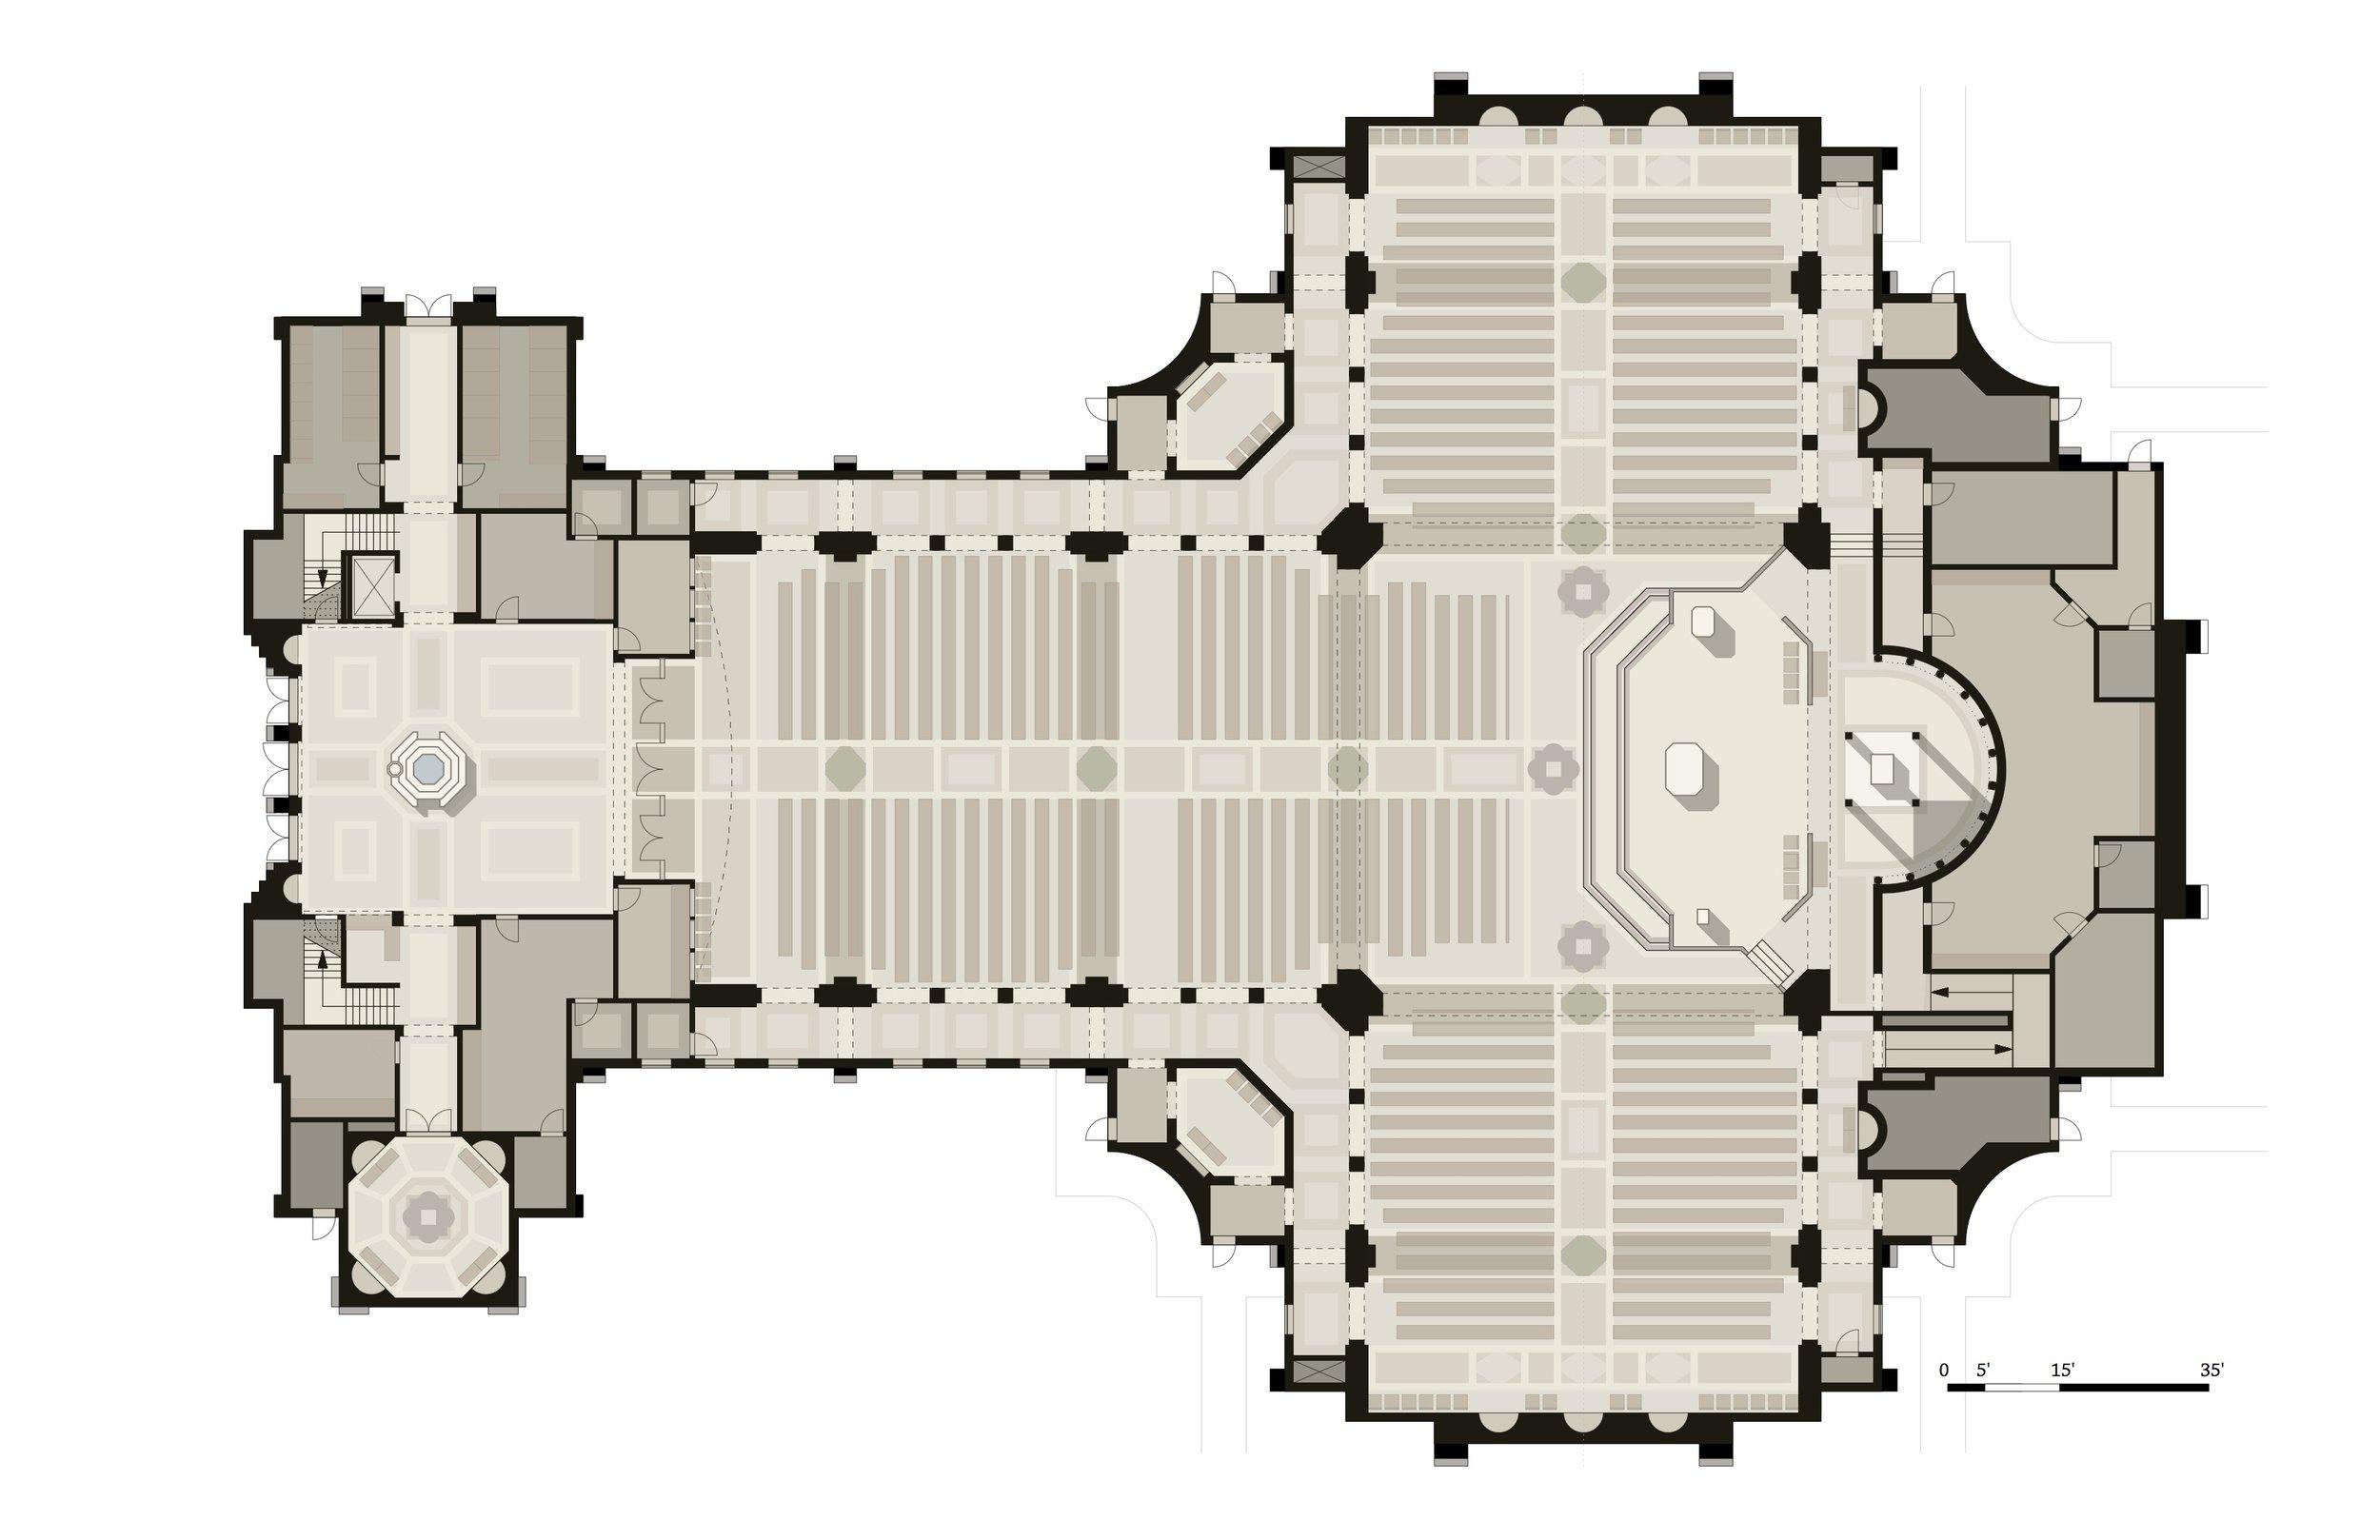 SMC - Colored Church Plan-nofootprint.jpg